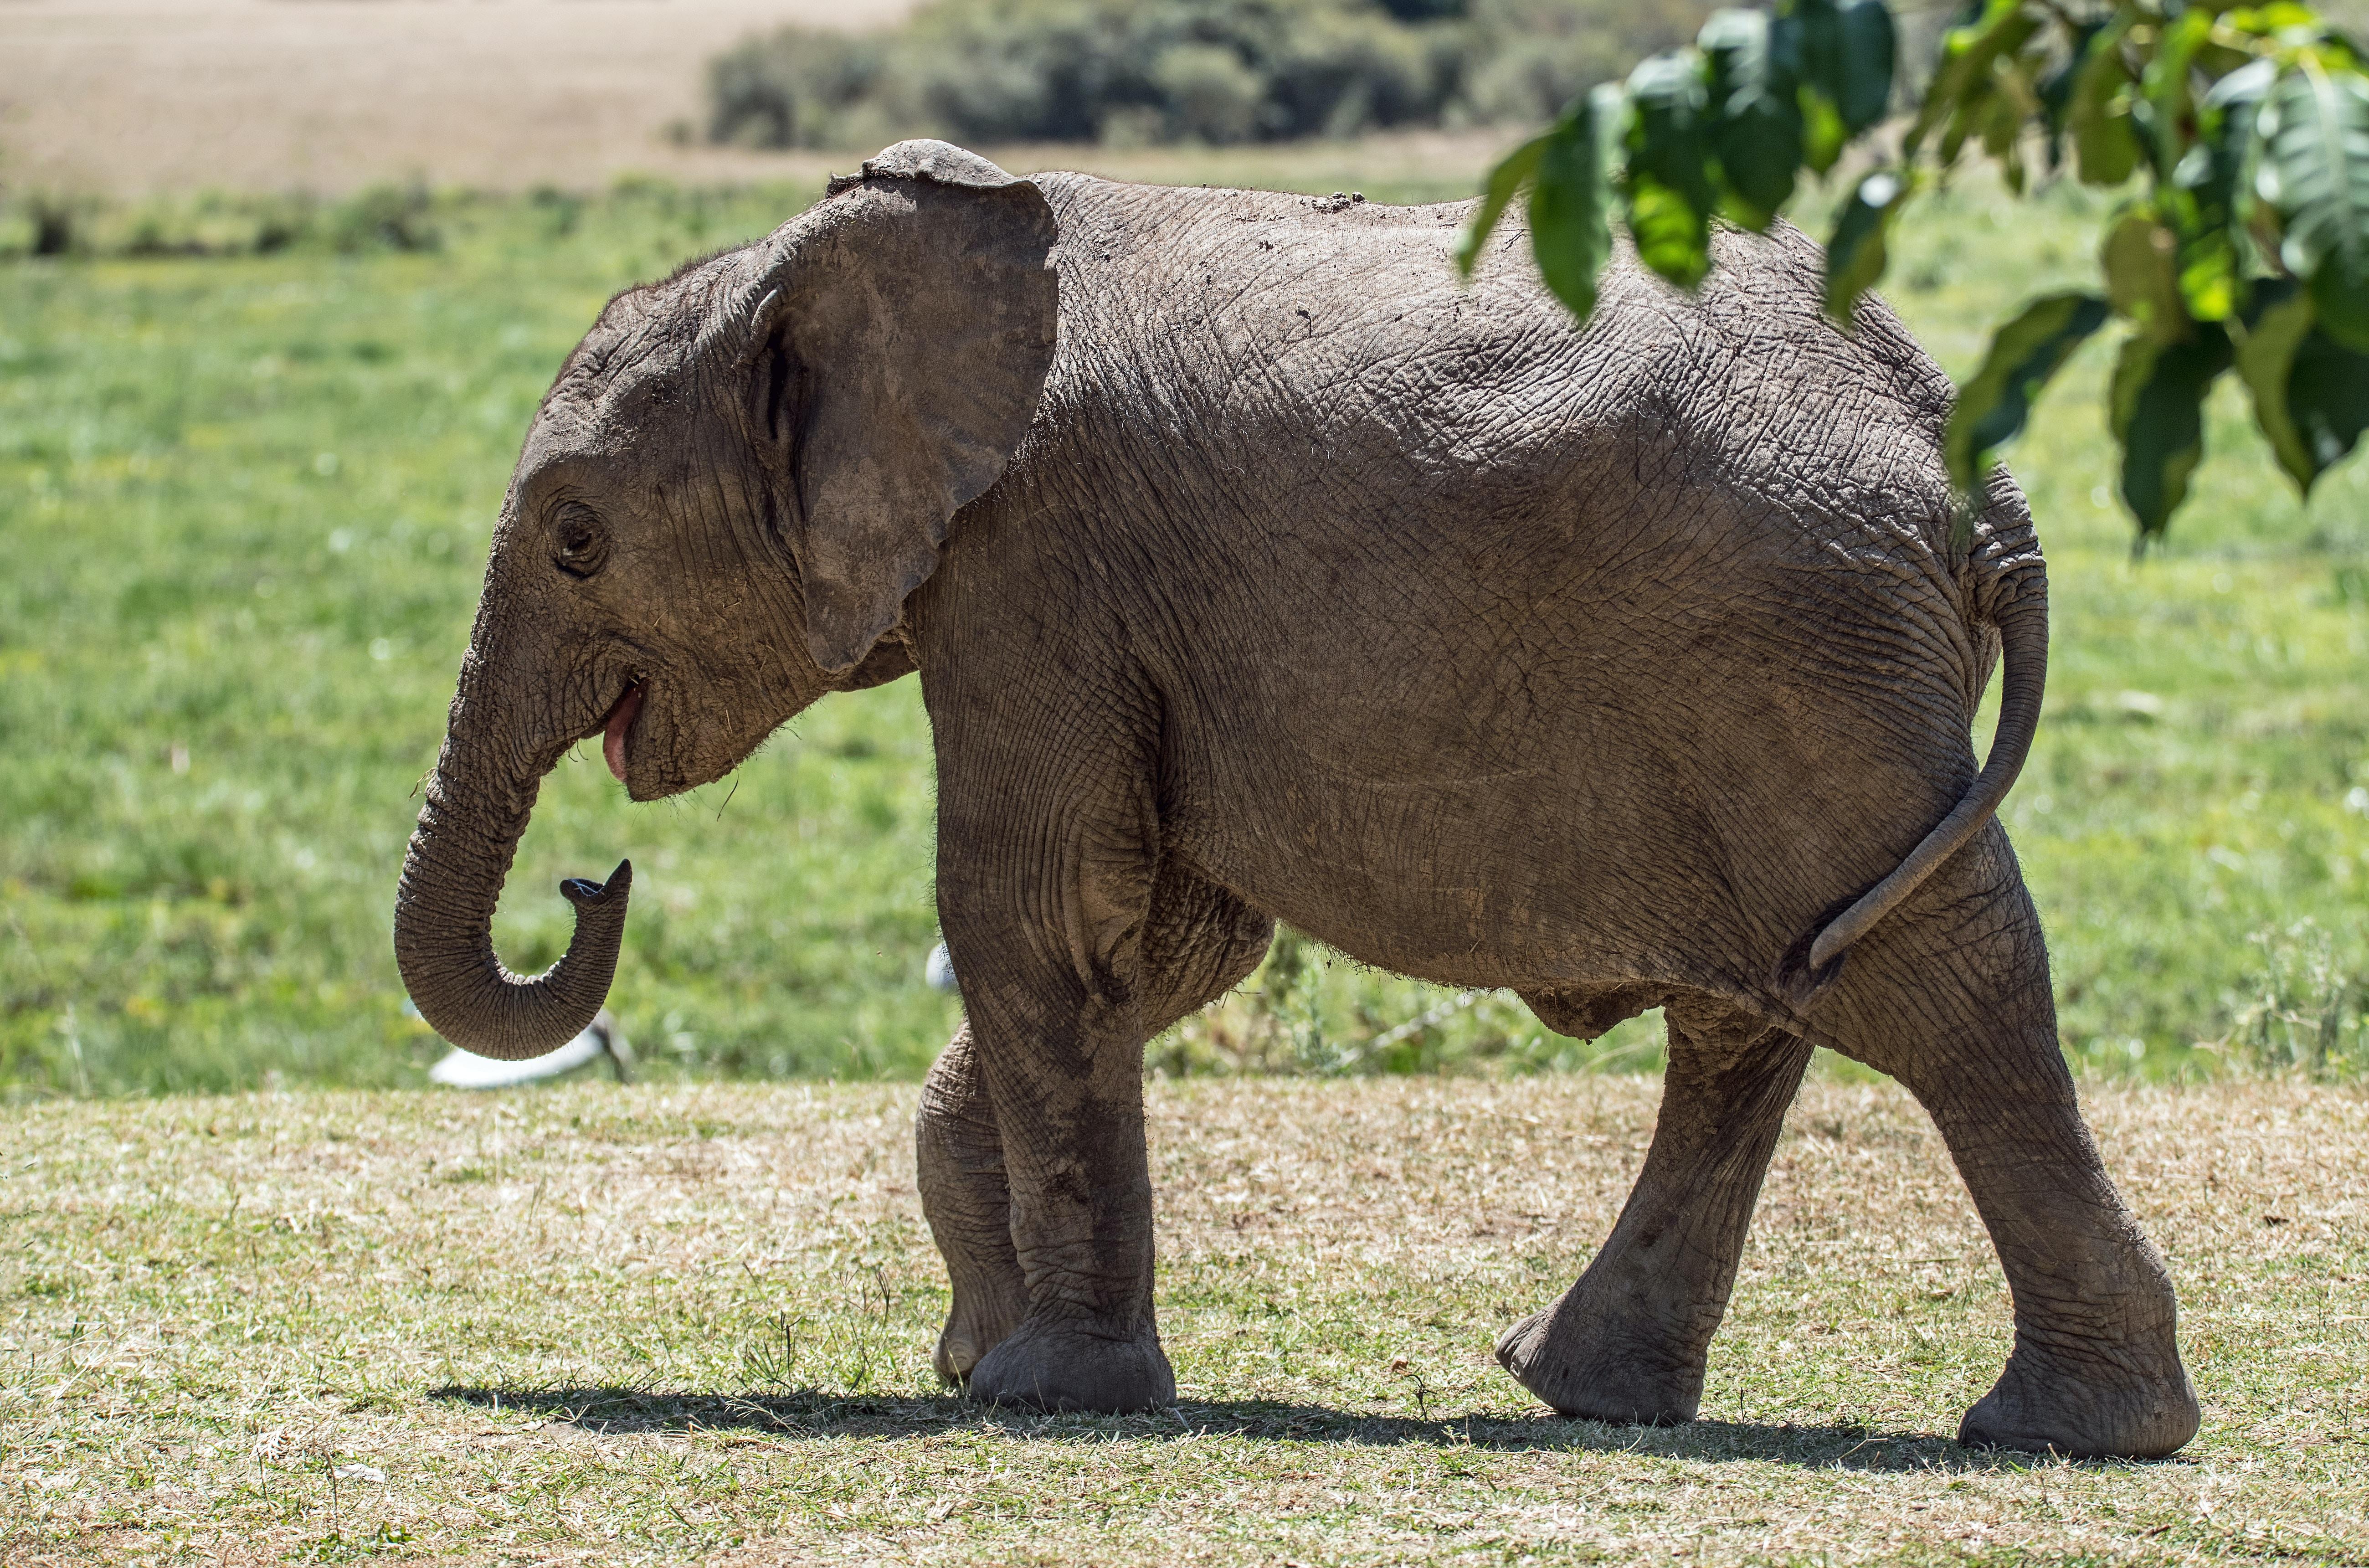 gray elephant standing on field